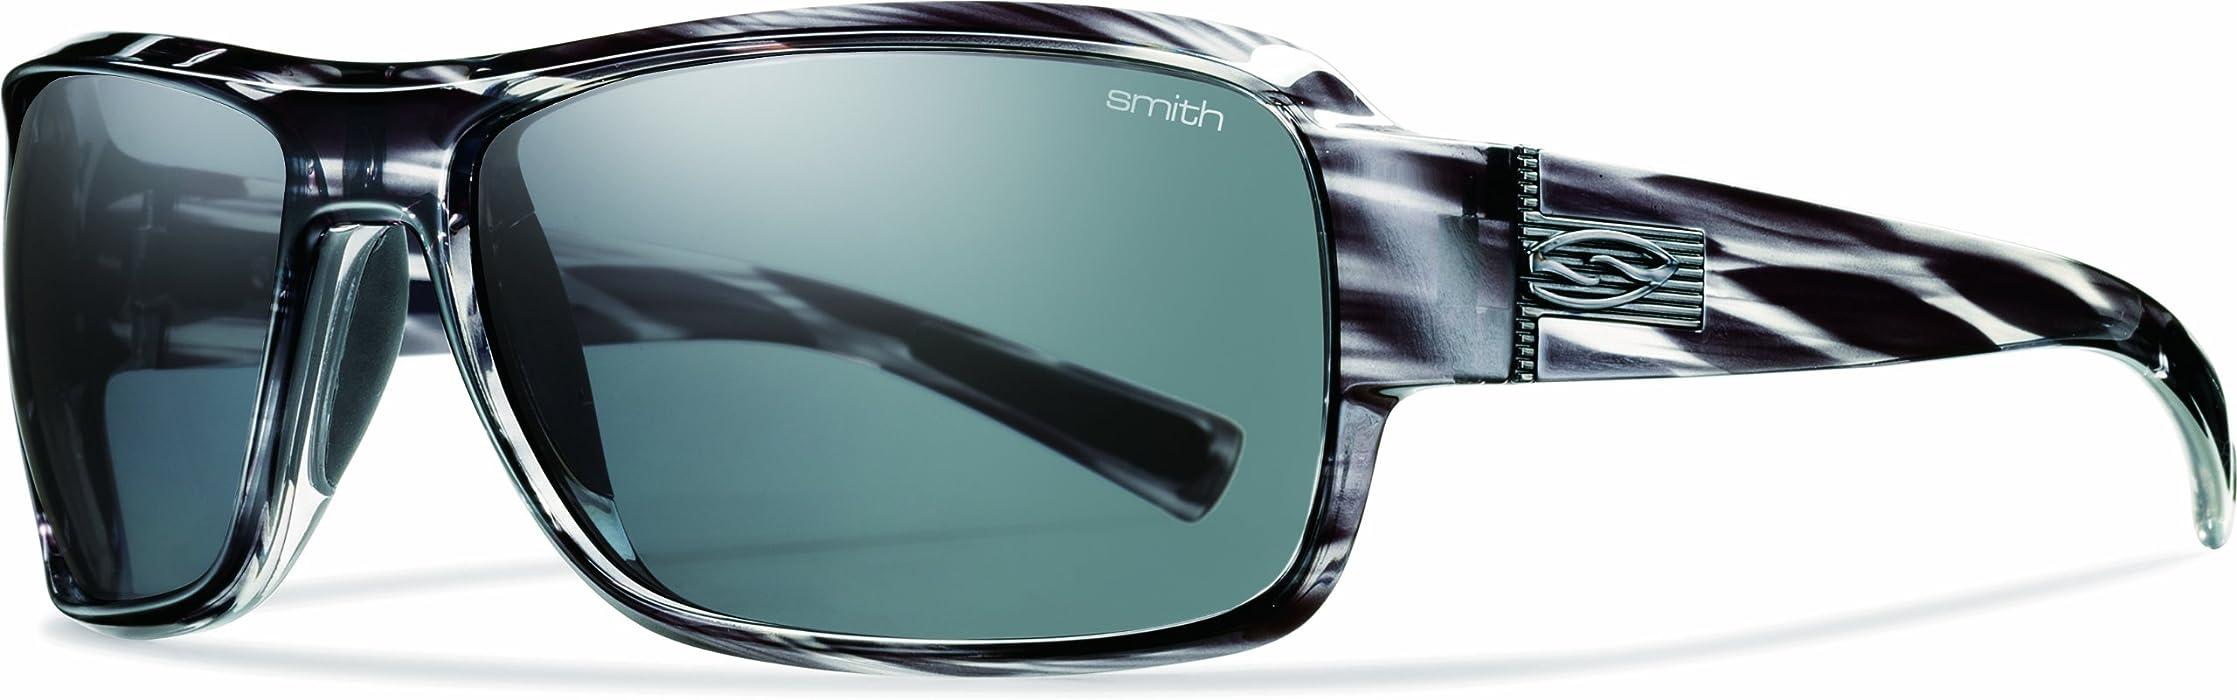 be8ab40caea Amazon.com  Smith Optics Rambler Sunglass